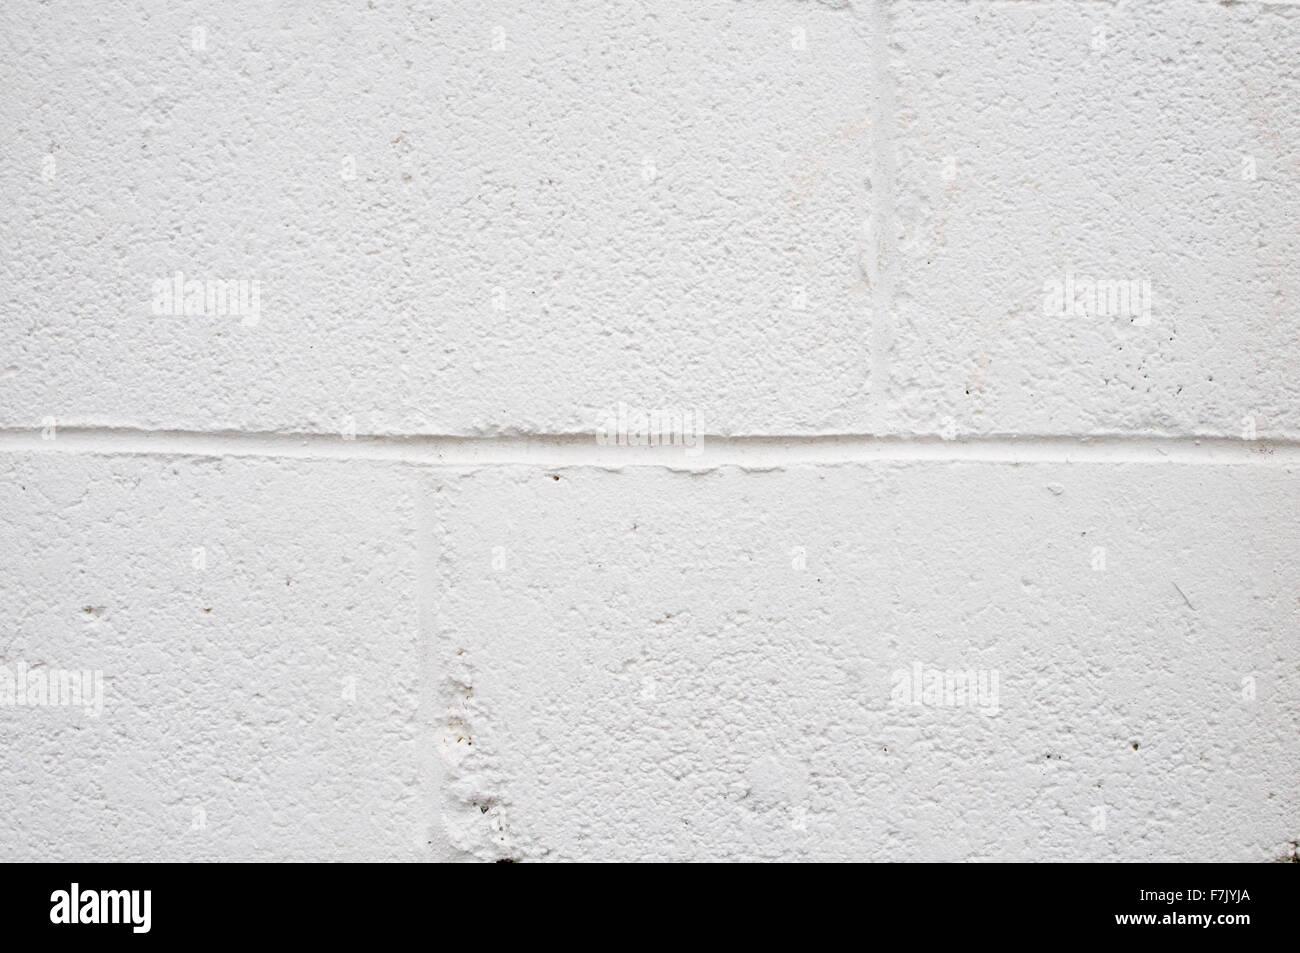 white wash stockfotos white wash bilder alamy. Black Bedroom Furniture Sets. Home Design Ideas